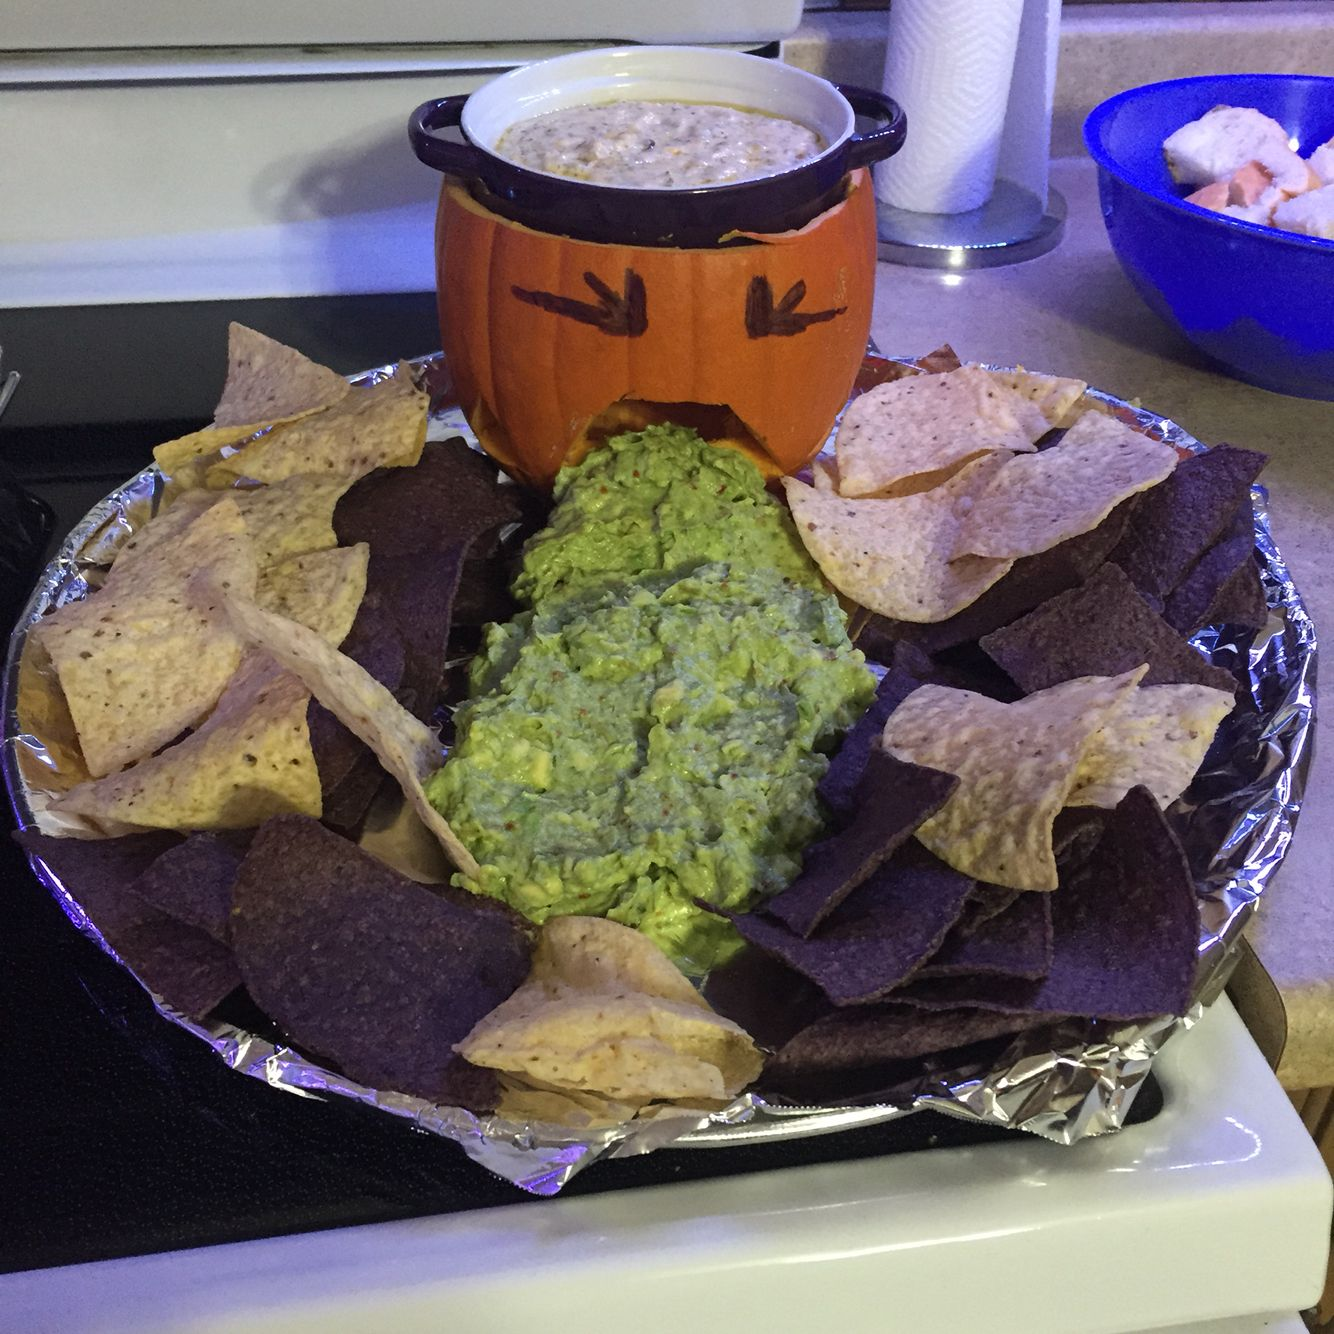 Halloween Food Puking Pumpkin Cheese Dip Brains And